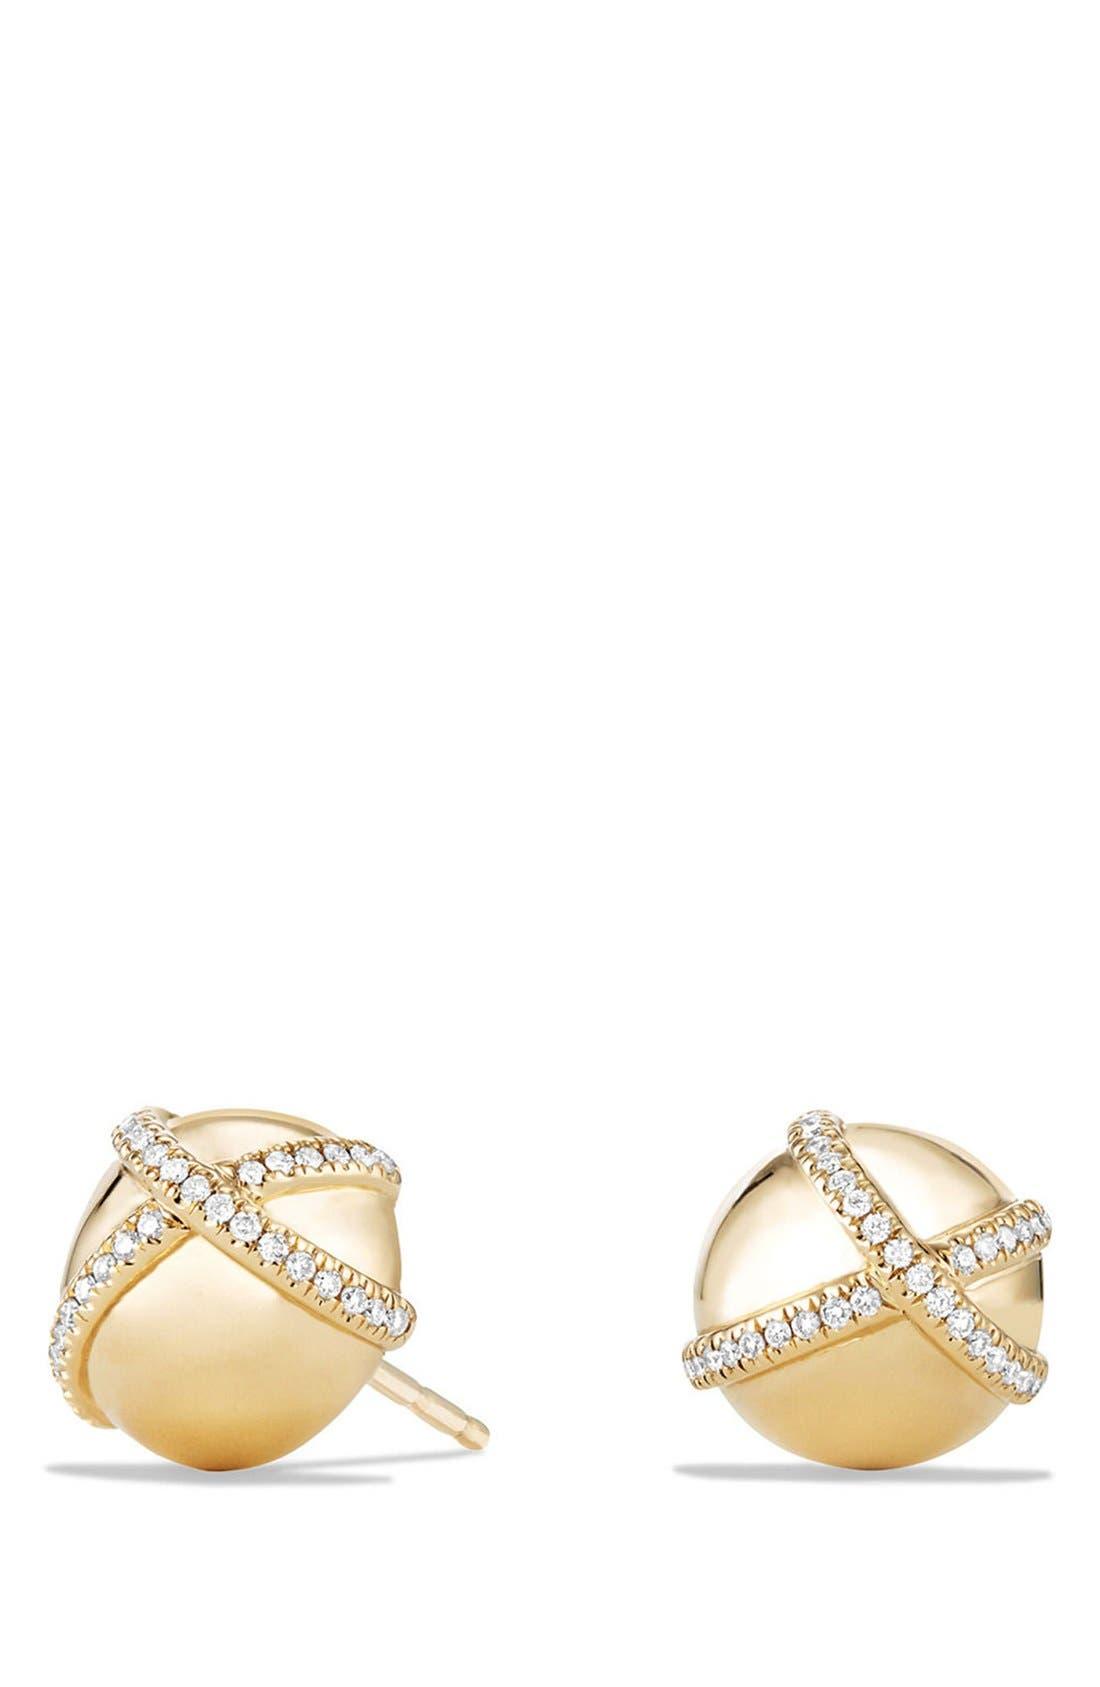 Main Image - David Yurman 'Solari' Wrap Stud Earrings with Pavé Diamonds in 18K Gold